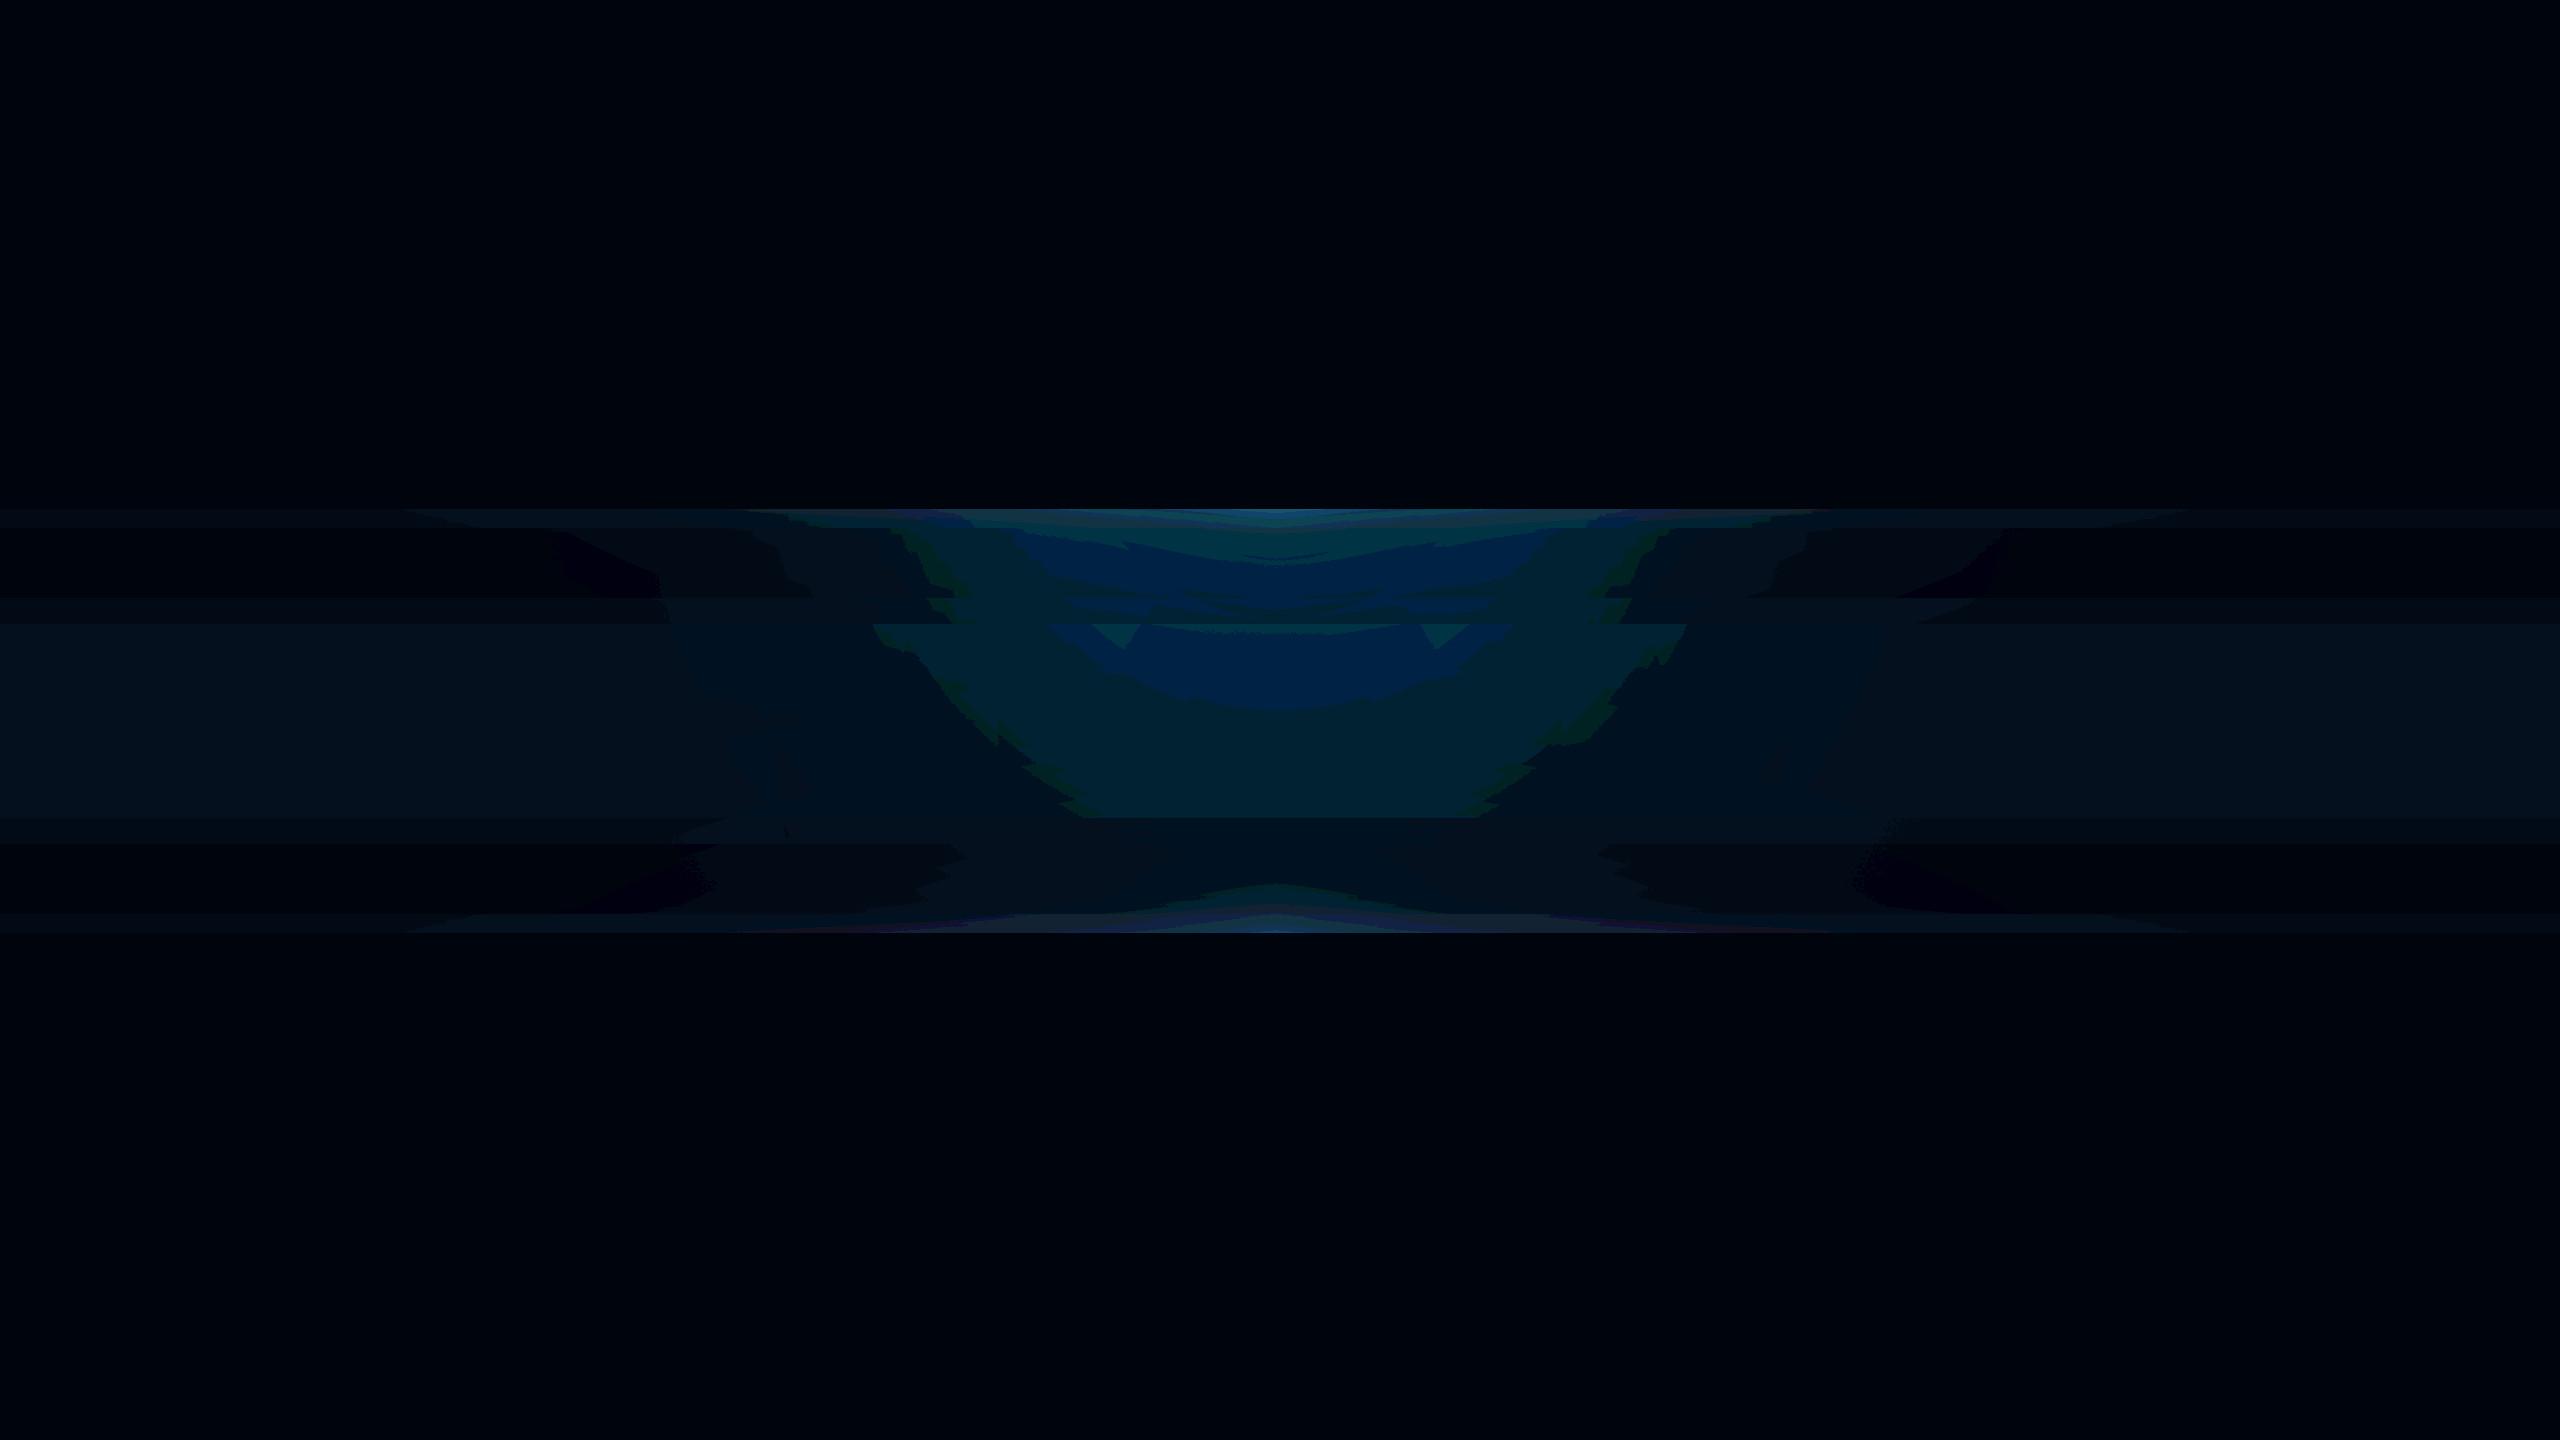 5f05721cc8991c96f75d45c7360eb858 5f05721cc8991c96f75d45c7360eb858: current  animated youtube …